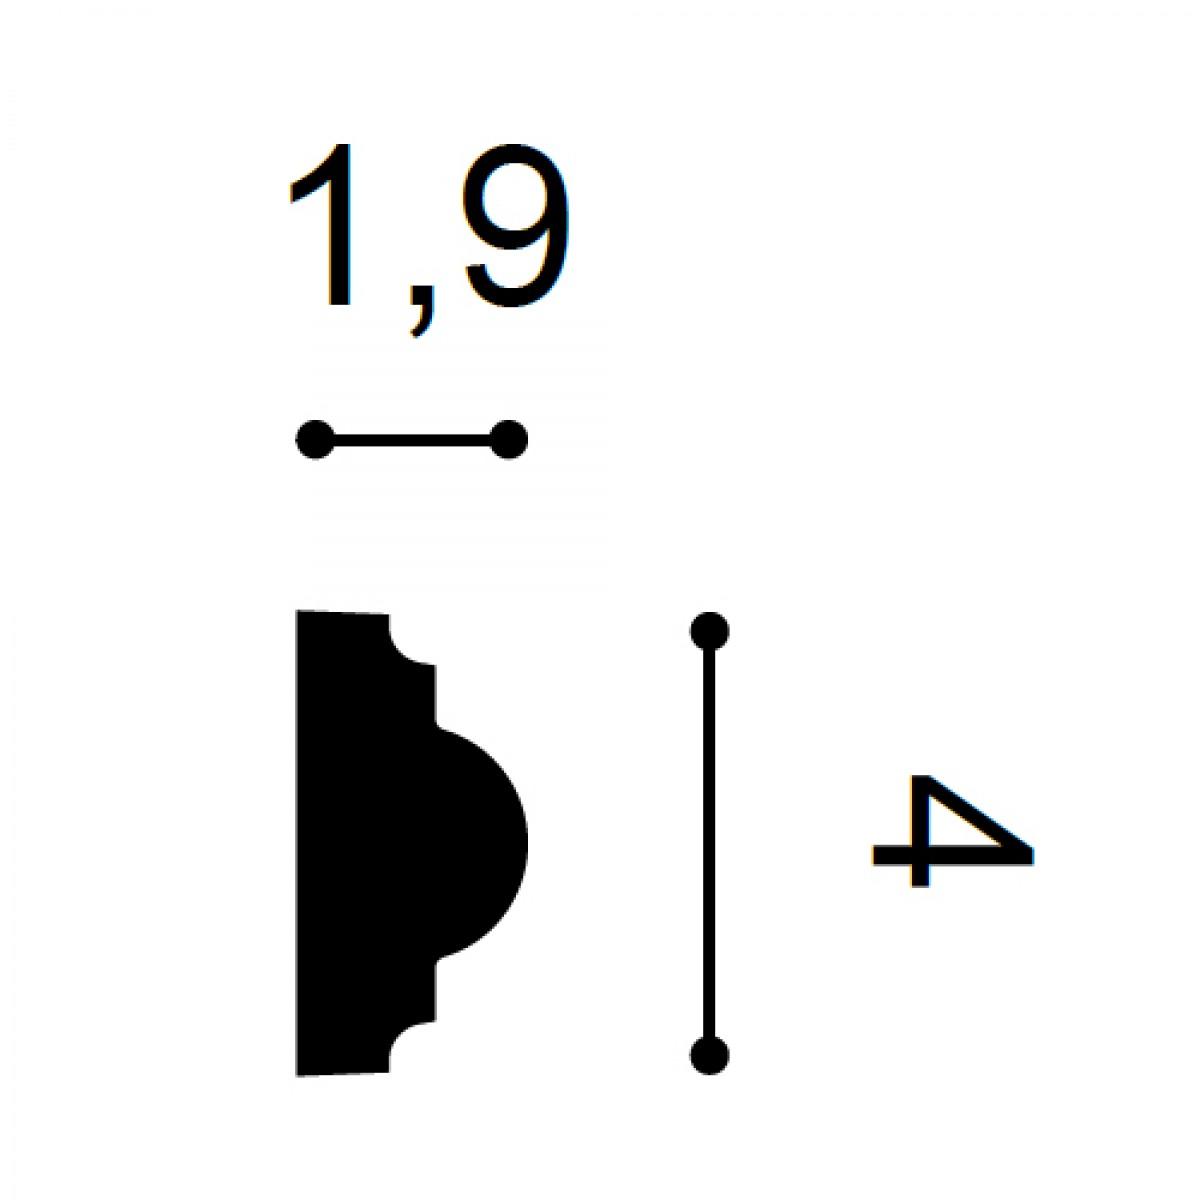 Brau Axxent PX131, Dimensiuni: 200 X 4 X 1.9 cm, Orac Decor